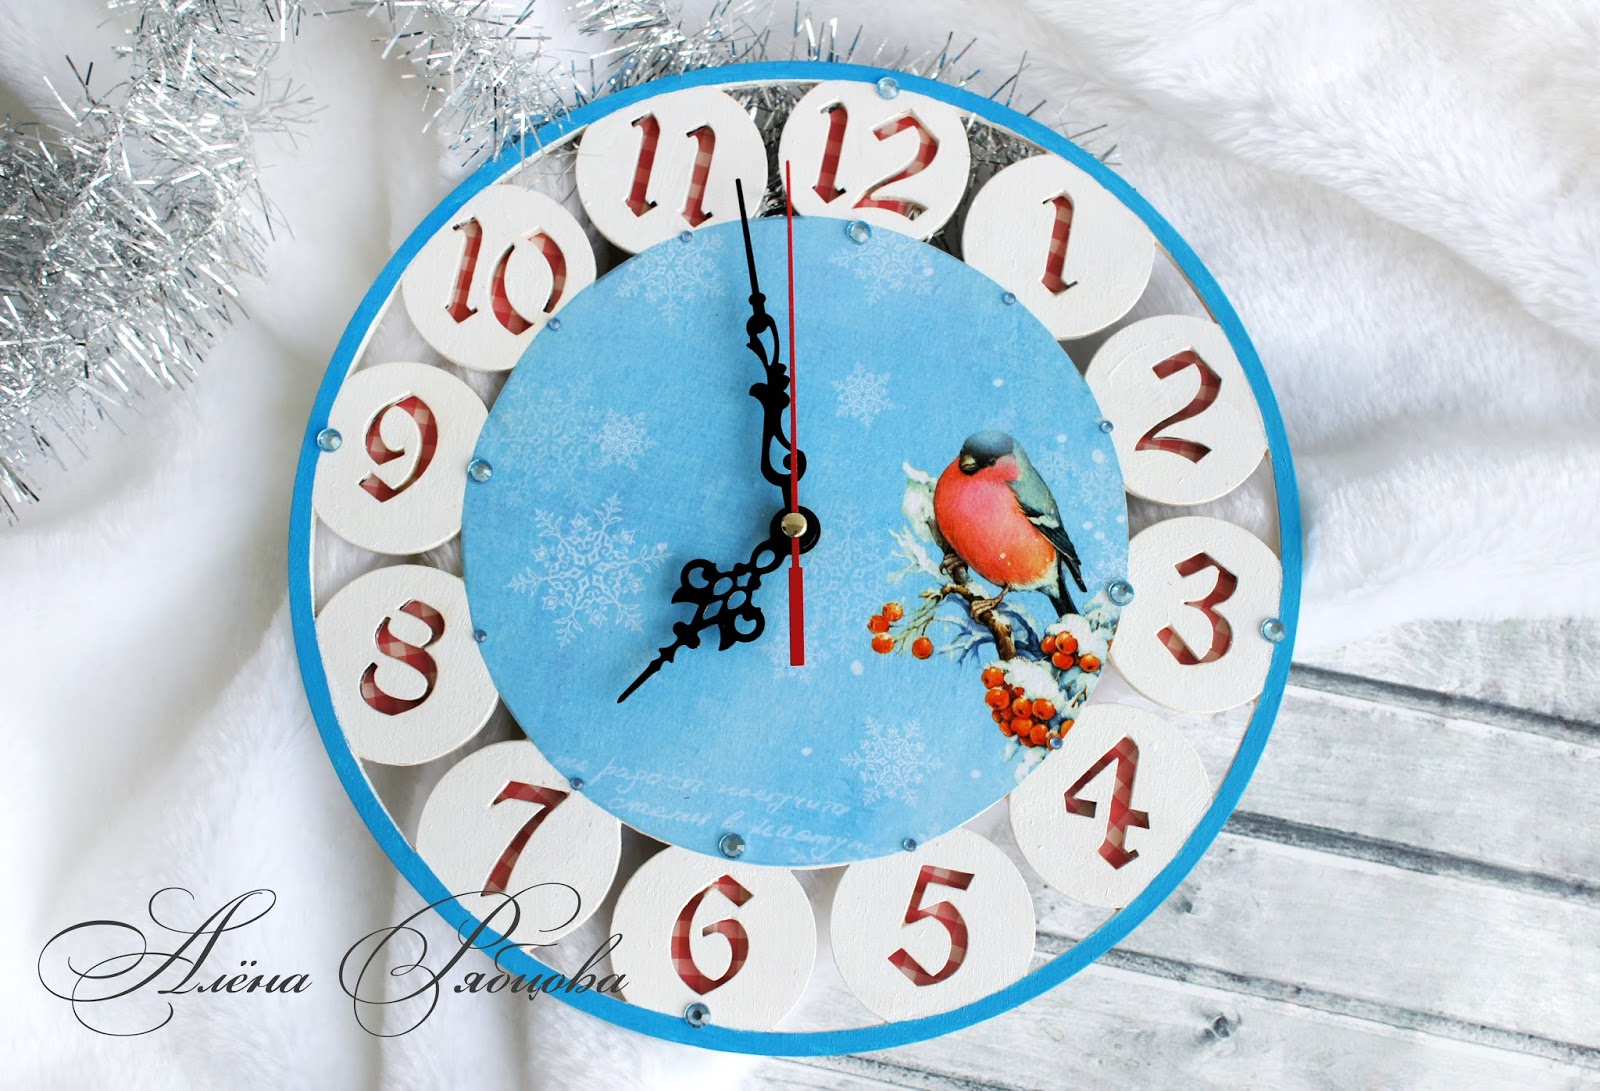 Картинки новогодних часов своими руками